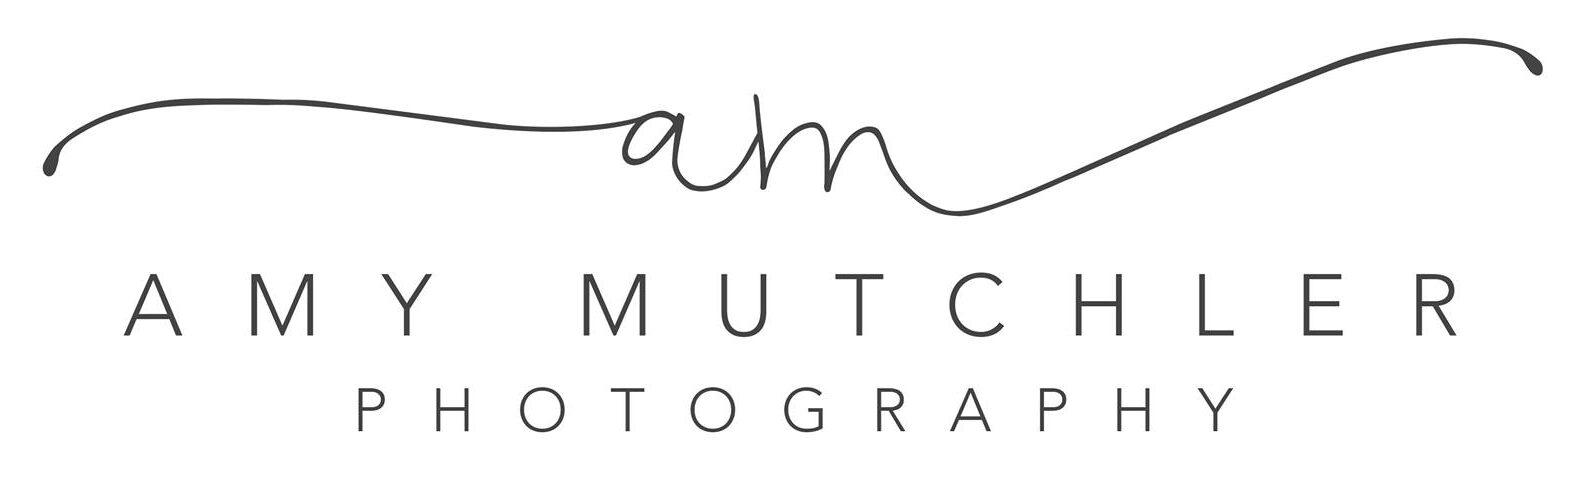 Amy Mutchler Photography